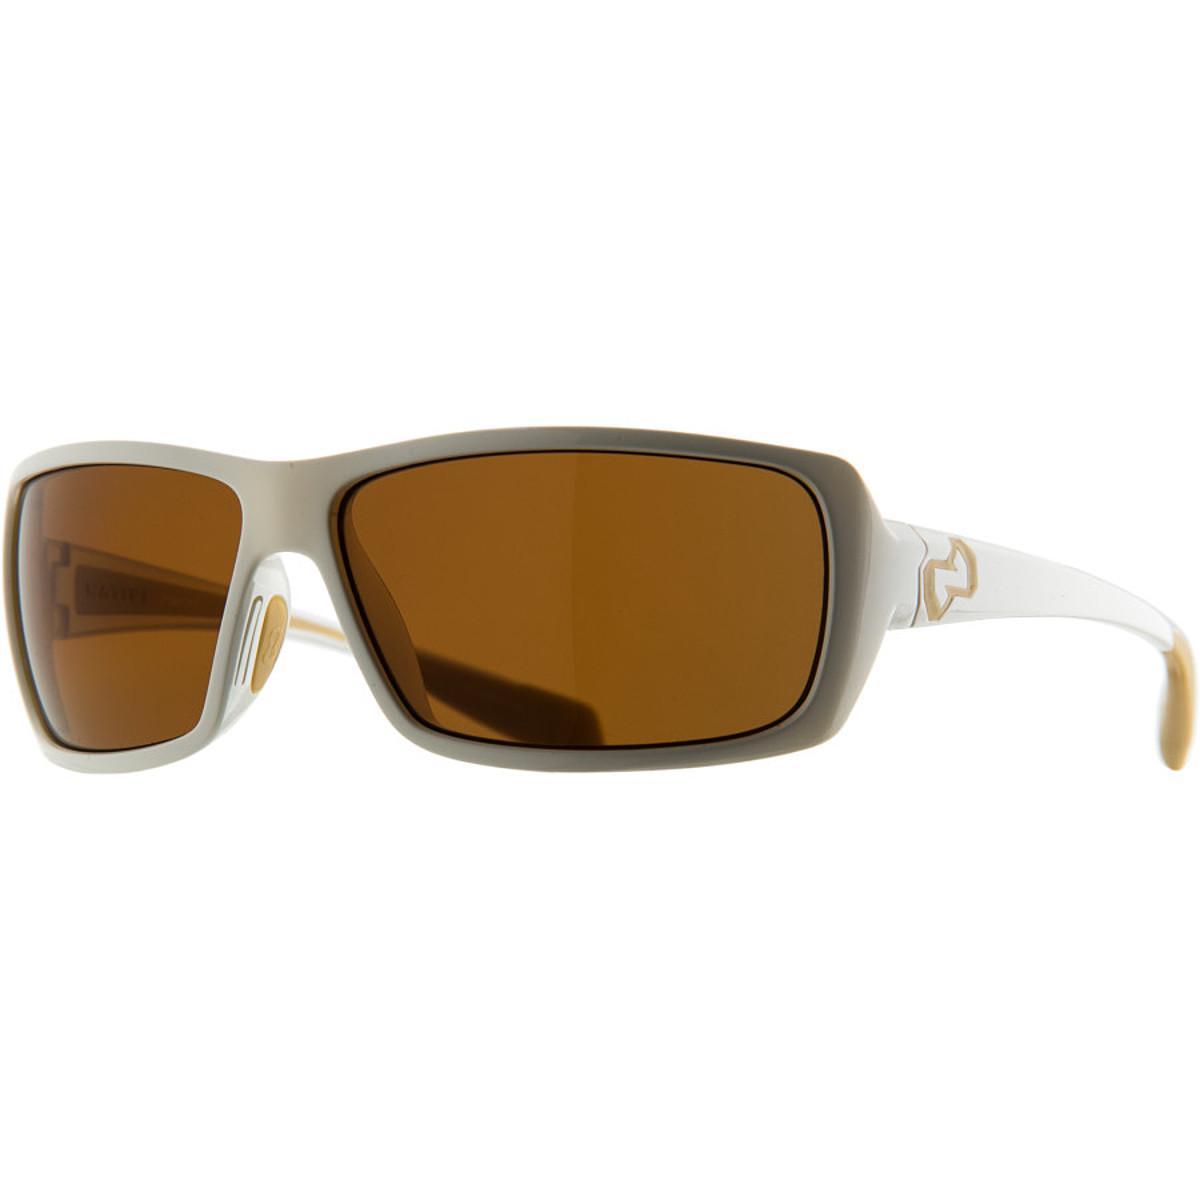 8d27c9e9ce Lyst - Native Eyewear Trango Sunglasses - Polarized in Brown for Men